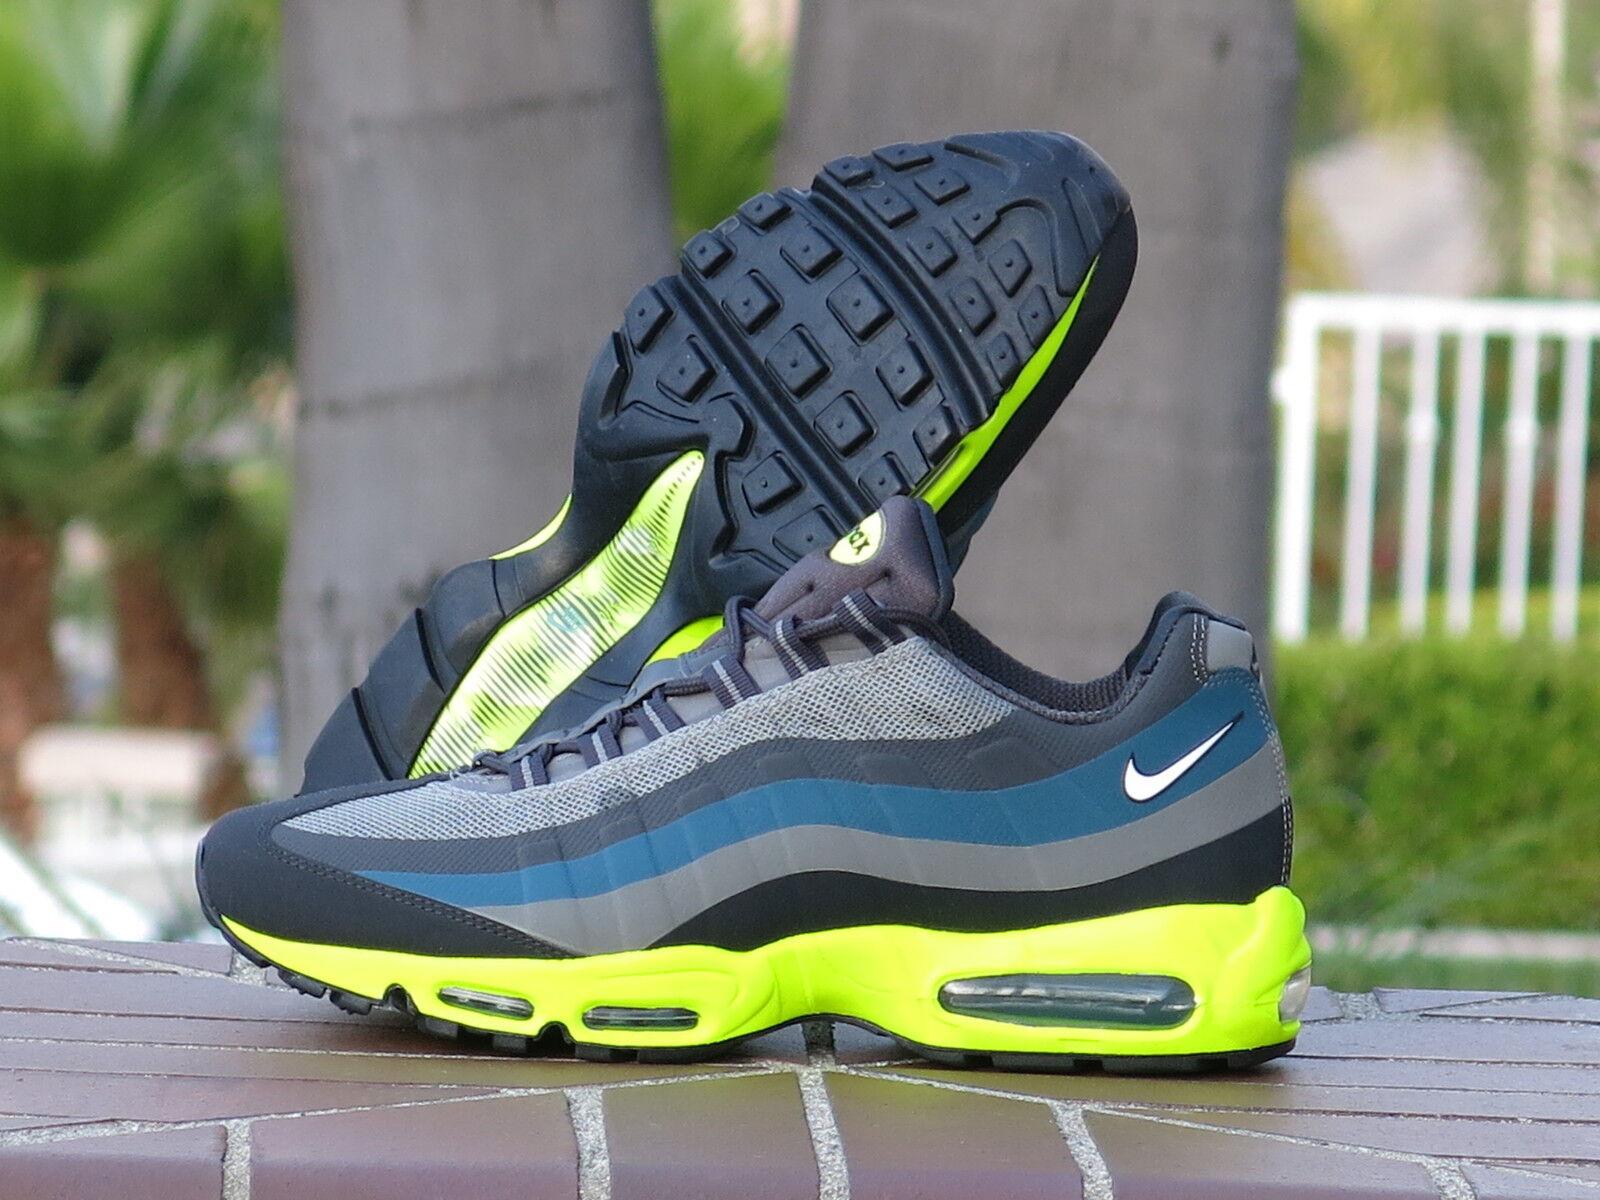 Nike Air Max 95 No-Sew Men's Running, Cross Training Sneakers 616190-007 SZ 12